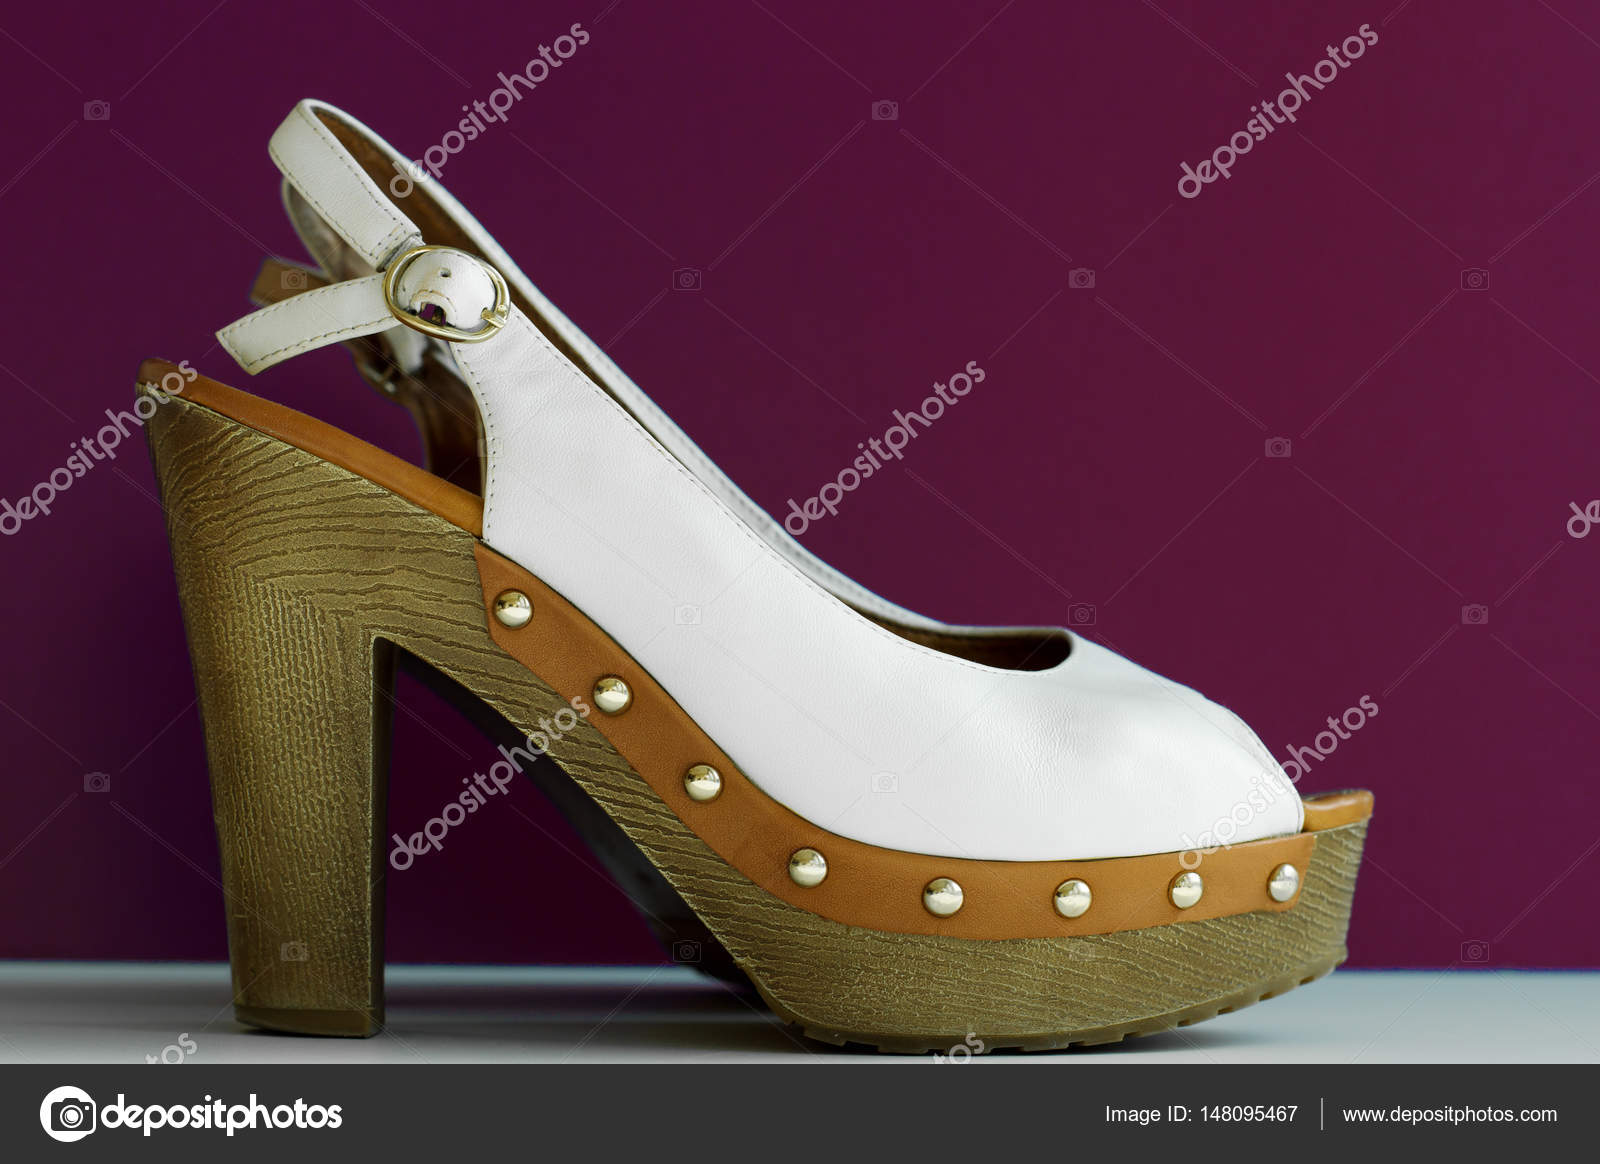 759a6295ba6 Λευκό καλοκαιρινό παπούτσια για τις γυναίκες σε ψηλά τακούνια σε μοβ ...